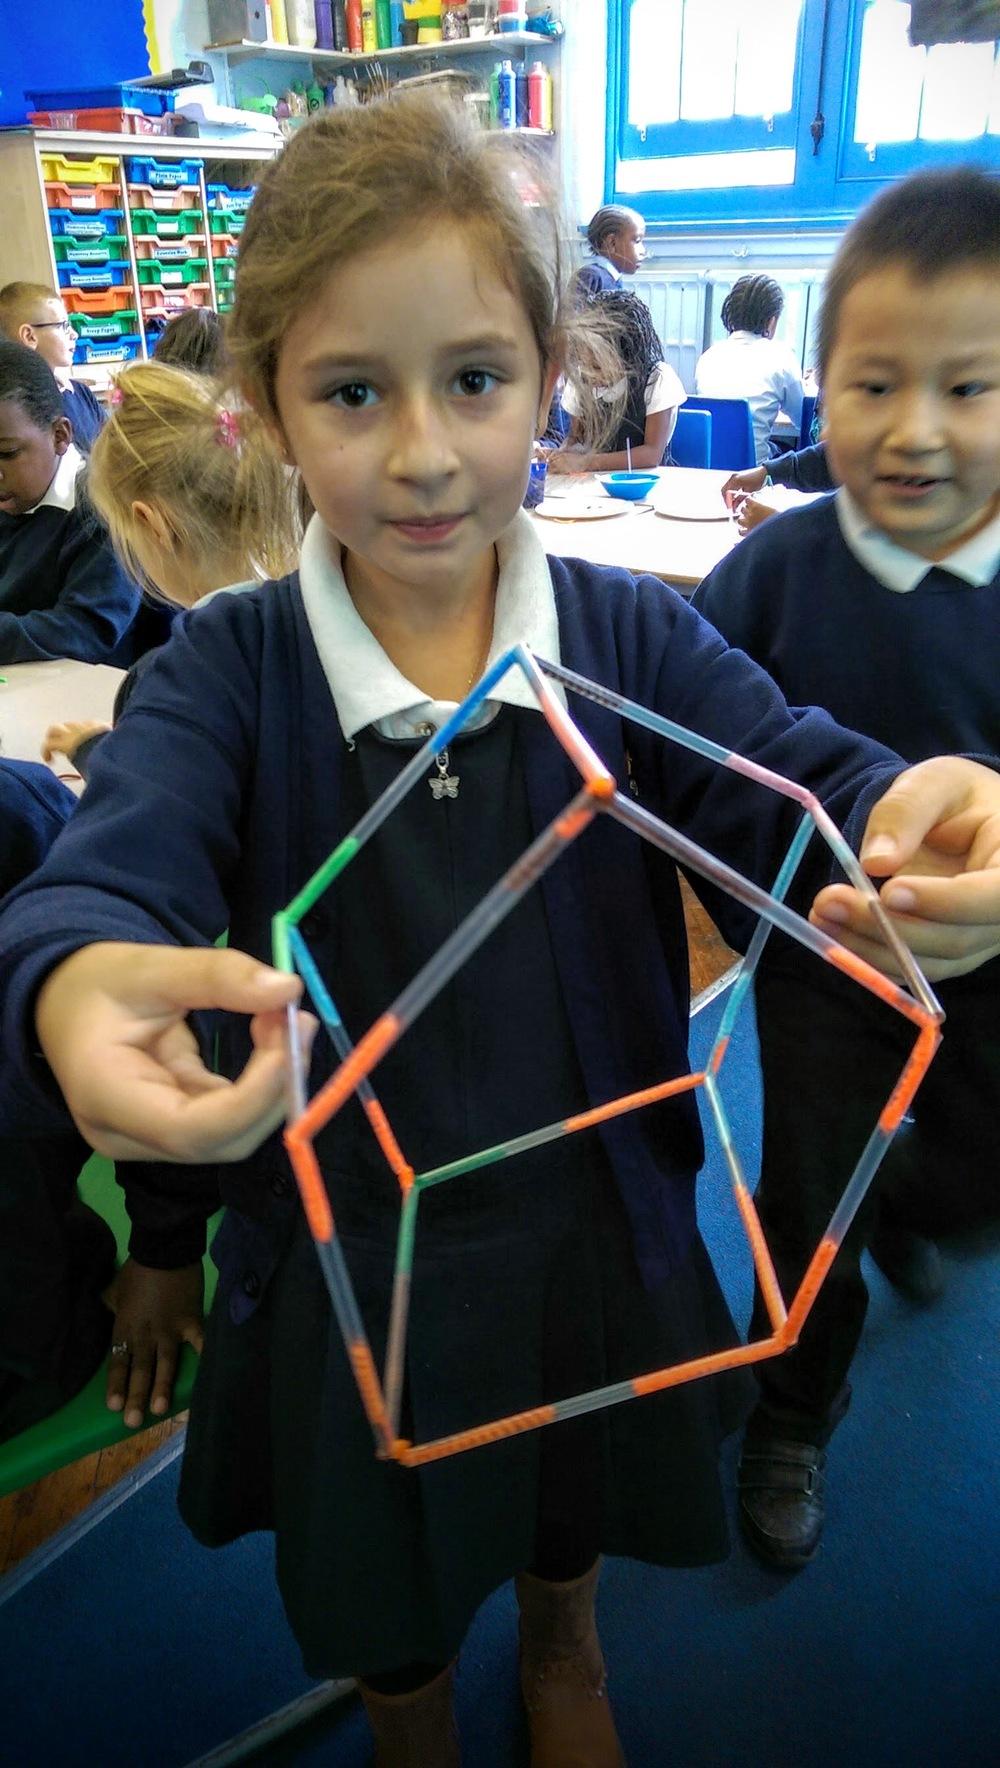 An amazing pentagonal prism.